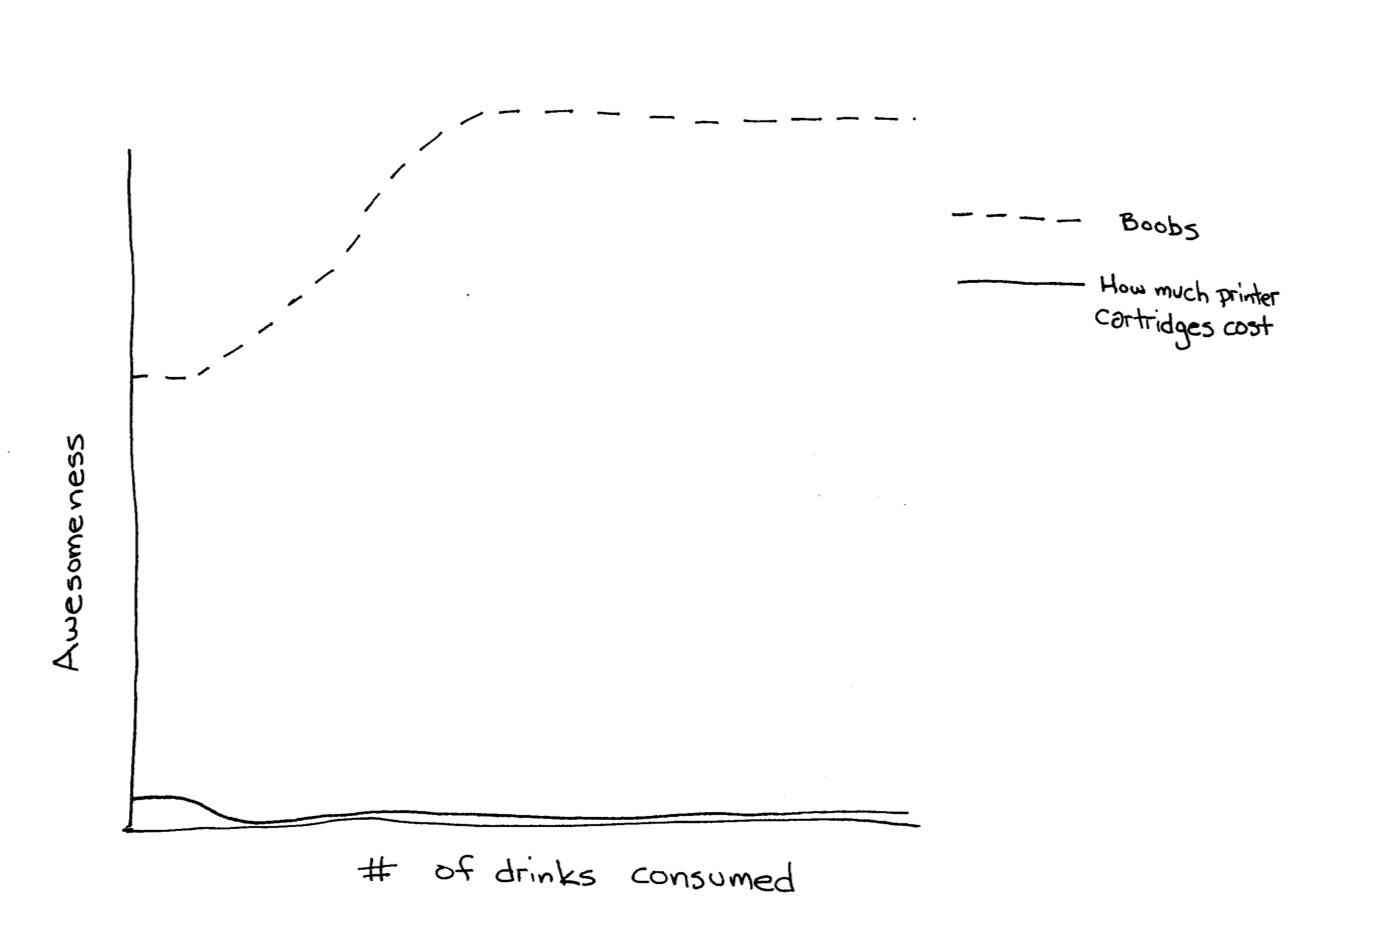 awesomenessgraph.jpg